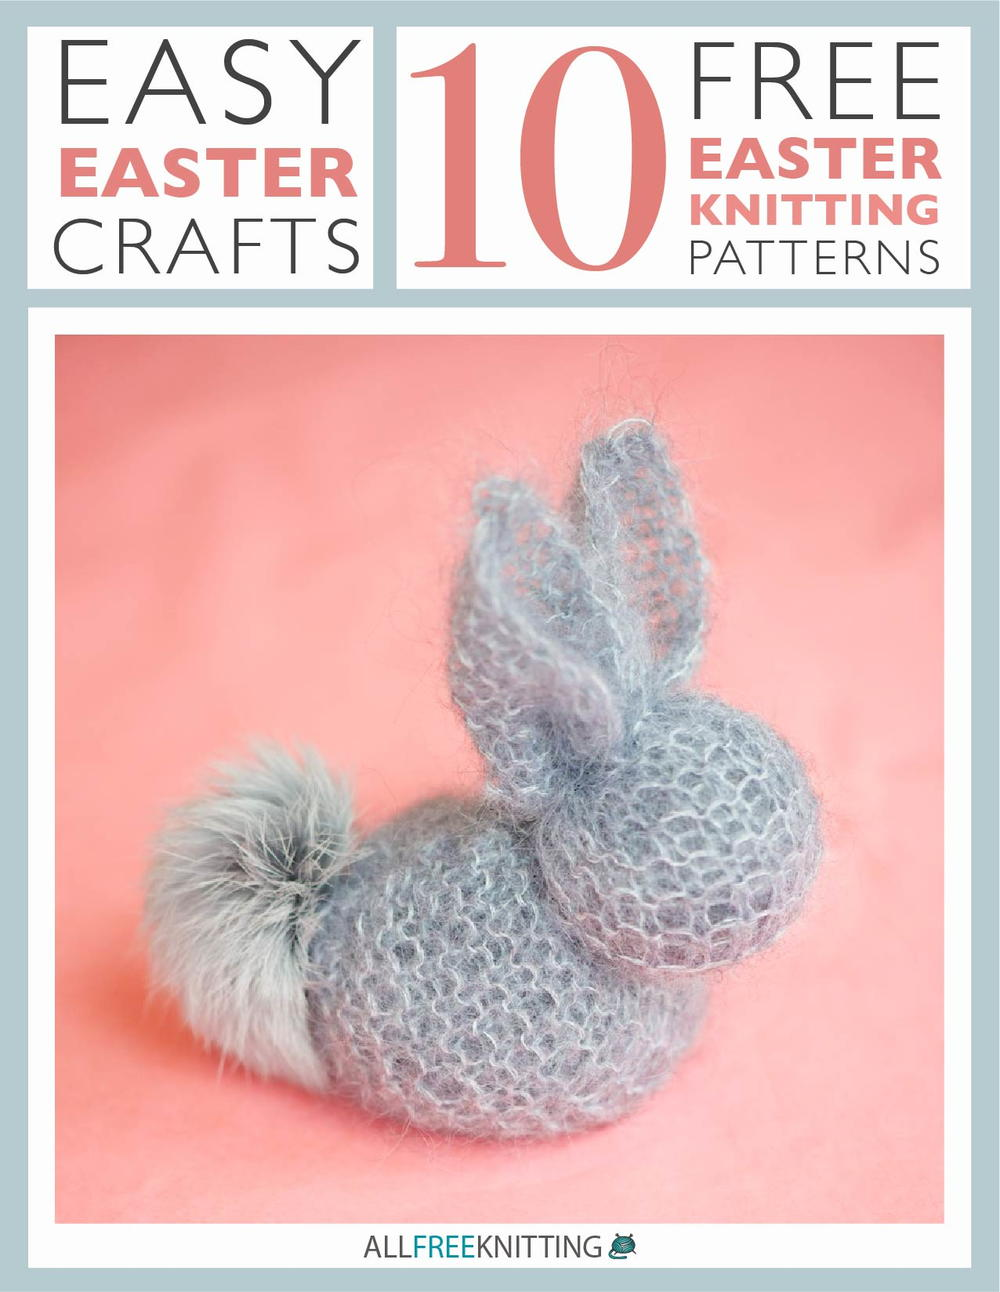 Easy easter crafts 10 free easter knitting patterns easy easter crafts 10 free easter knitting patterns allfreeknitting bankloansurffo Choice Image